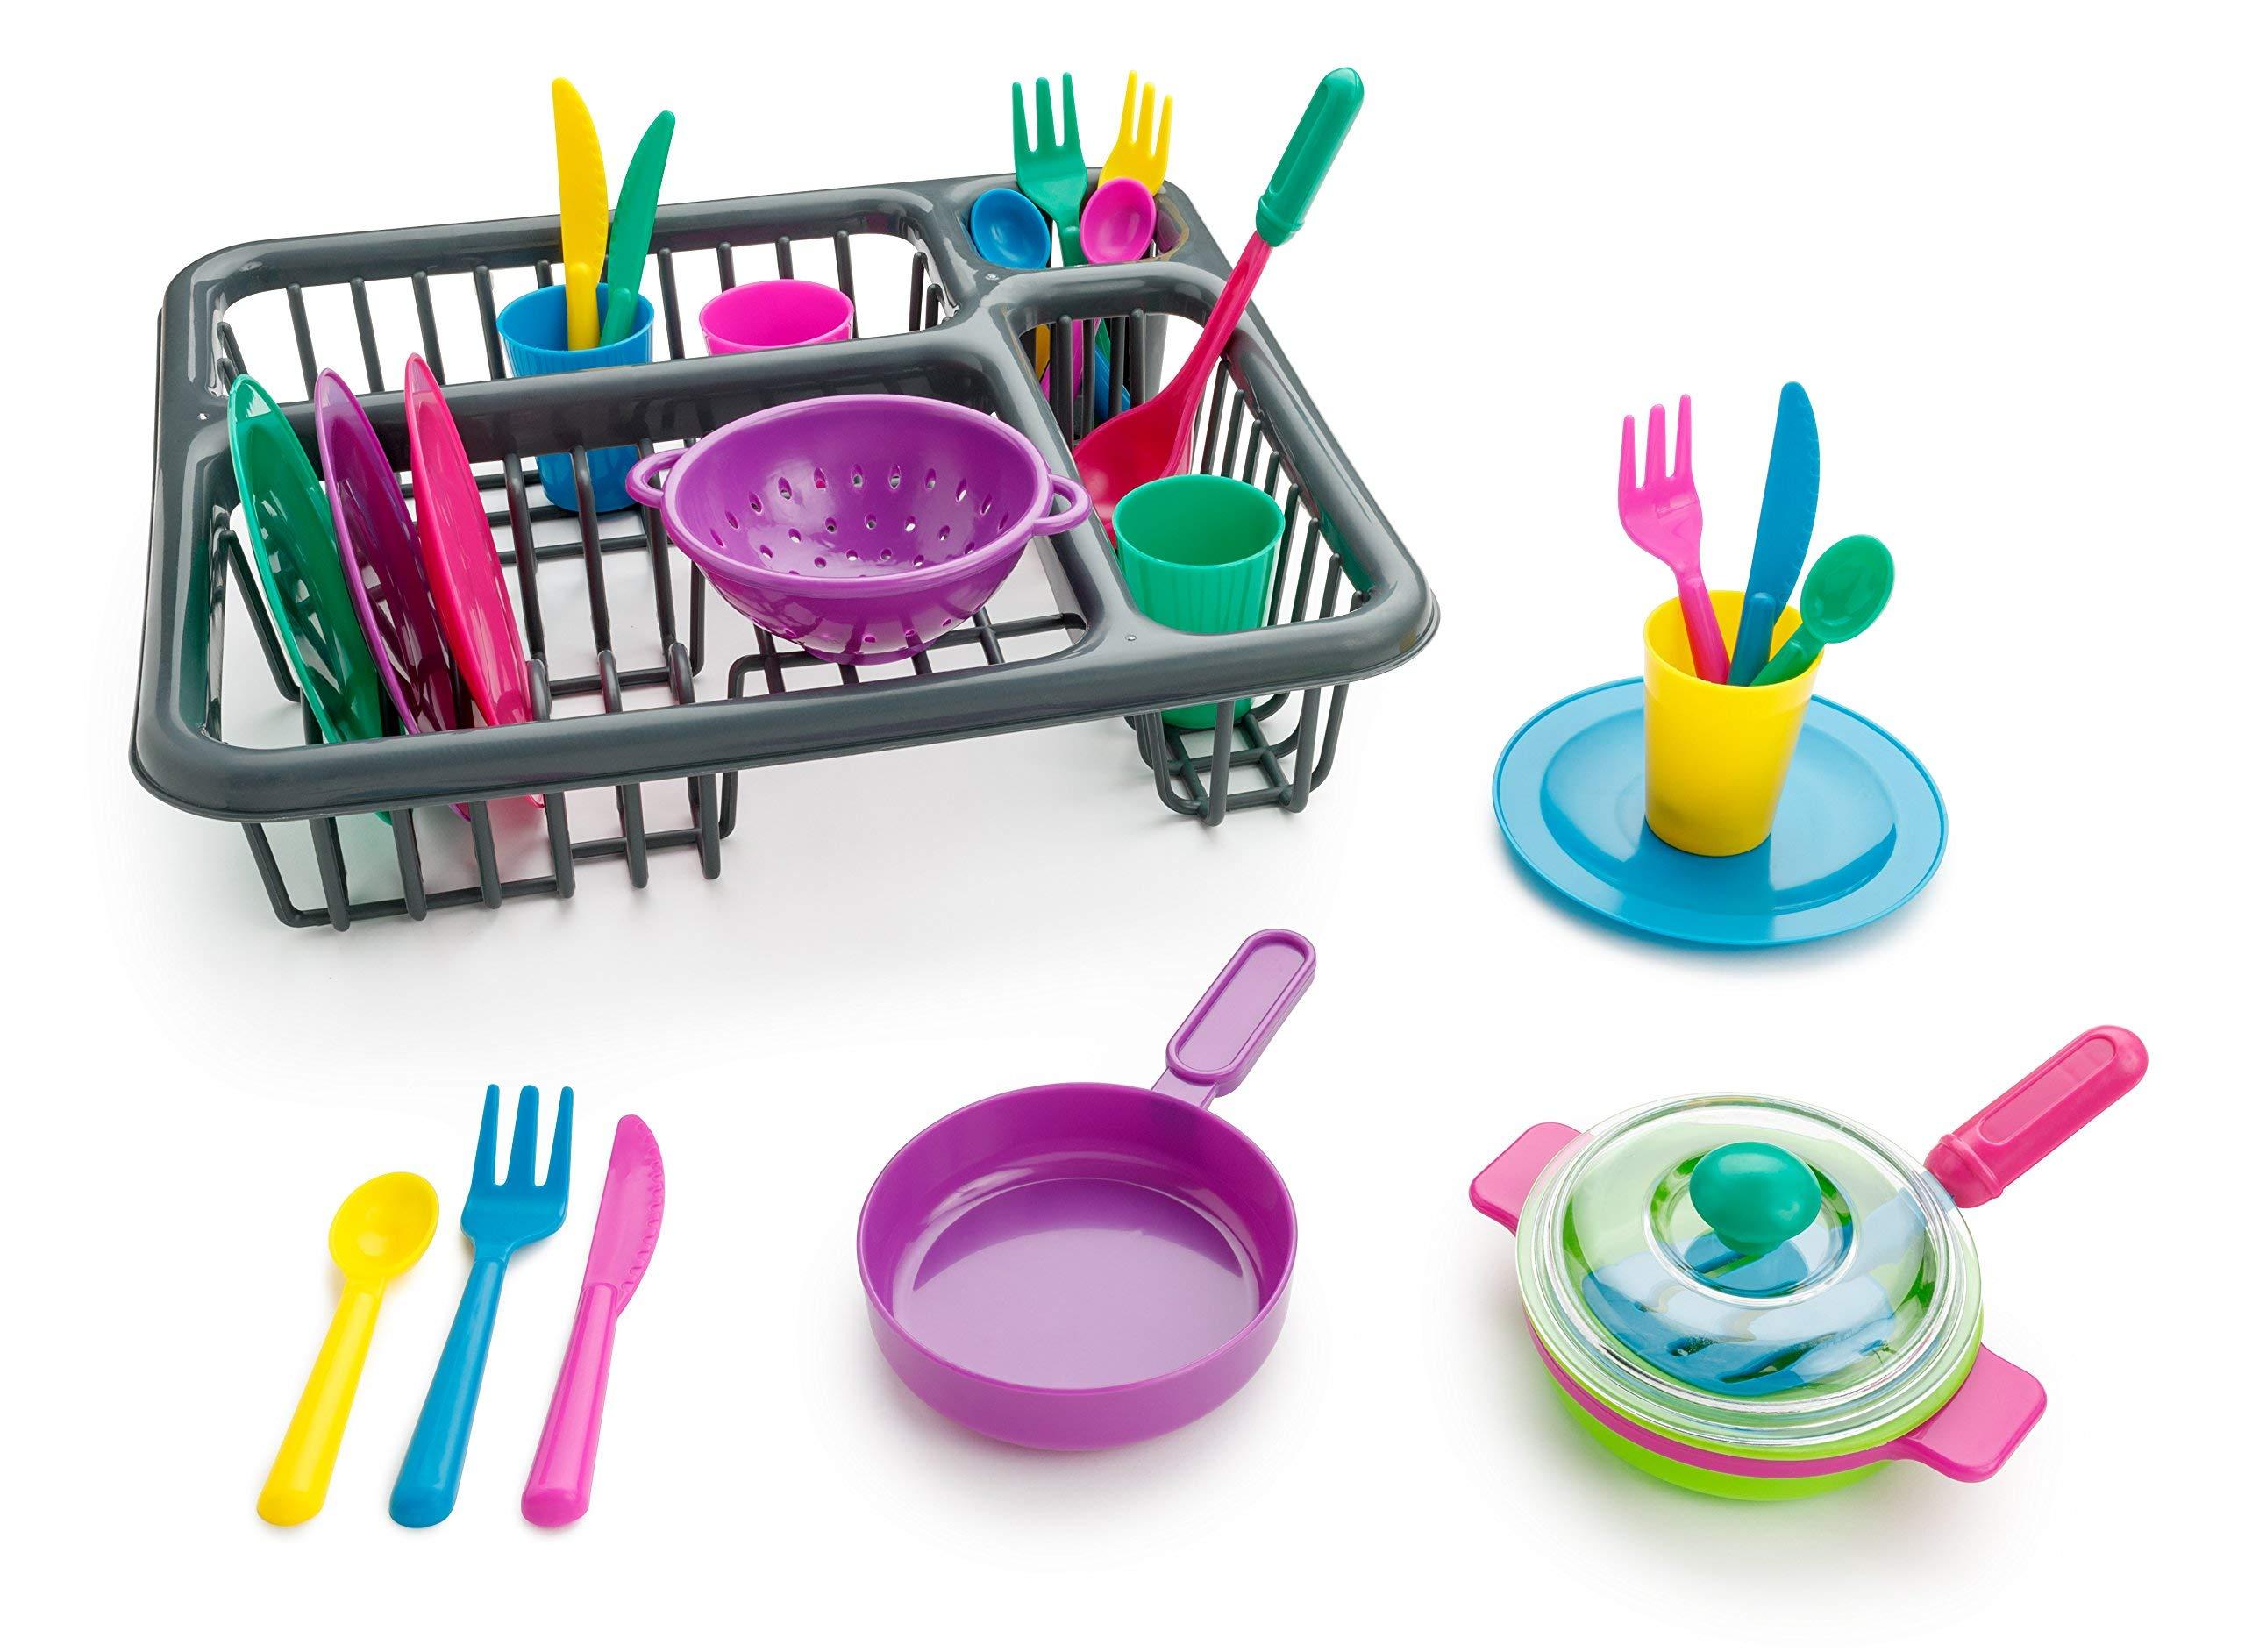 Playkidz: Super Durable Kids Play Dishes - Pretend Play Childrens Dish Set - 27 Piece with Drainer by Playkidz